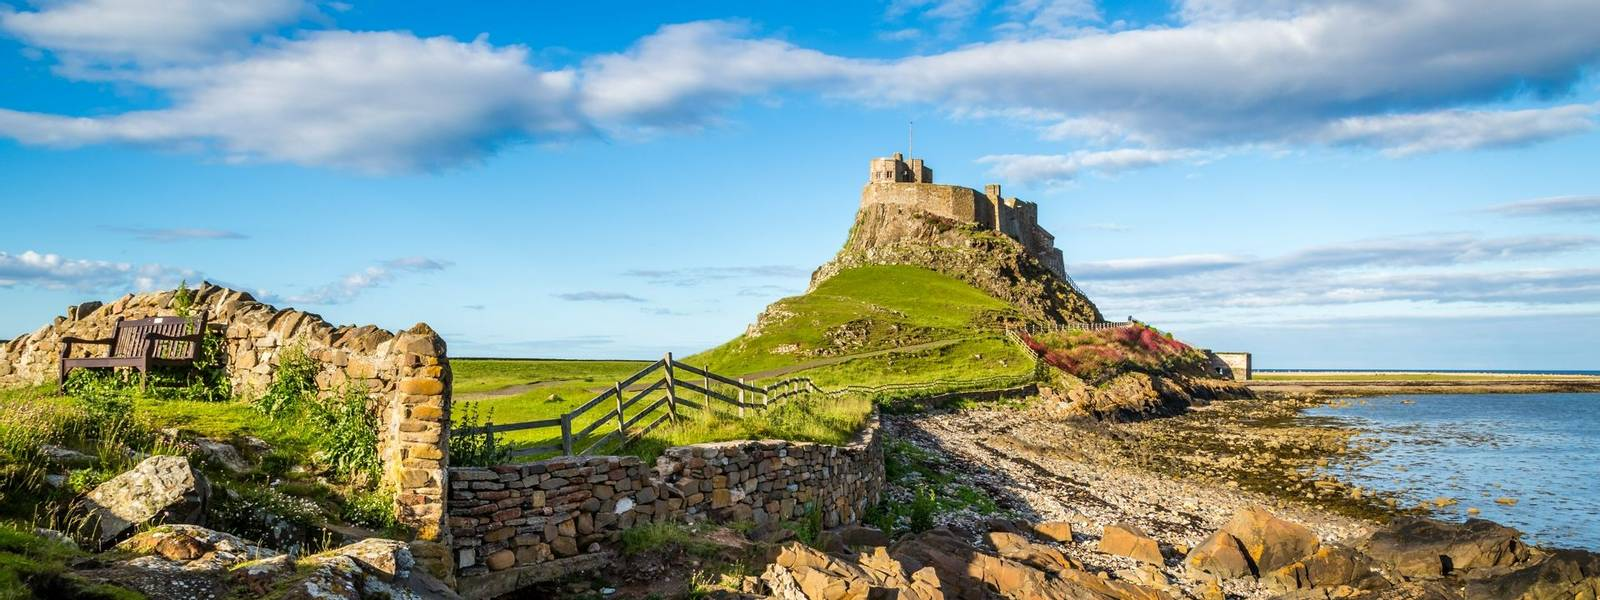 HeritageTour-EarlyHeritage-Northumberland-AdobeStock_113988041.jpeg